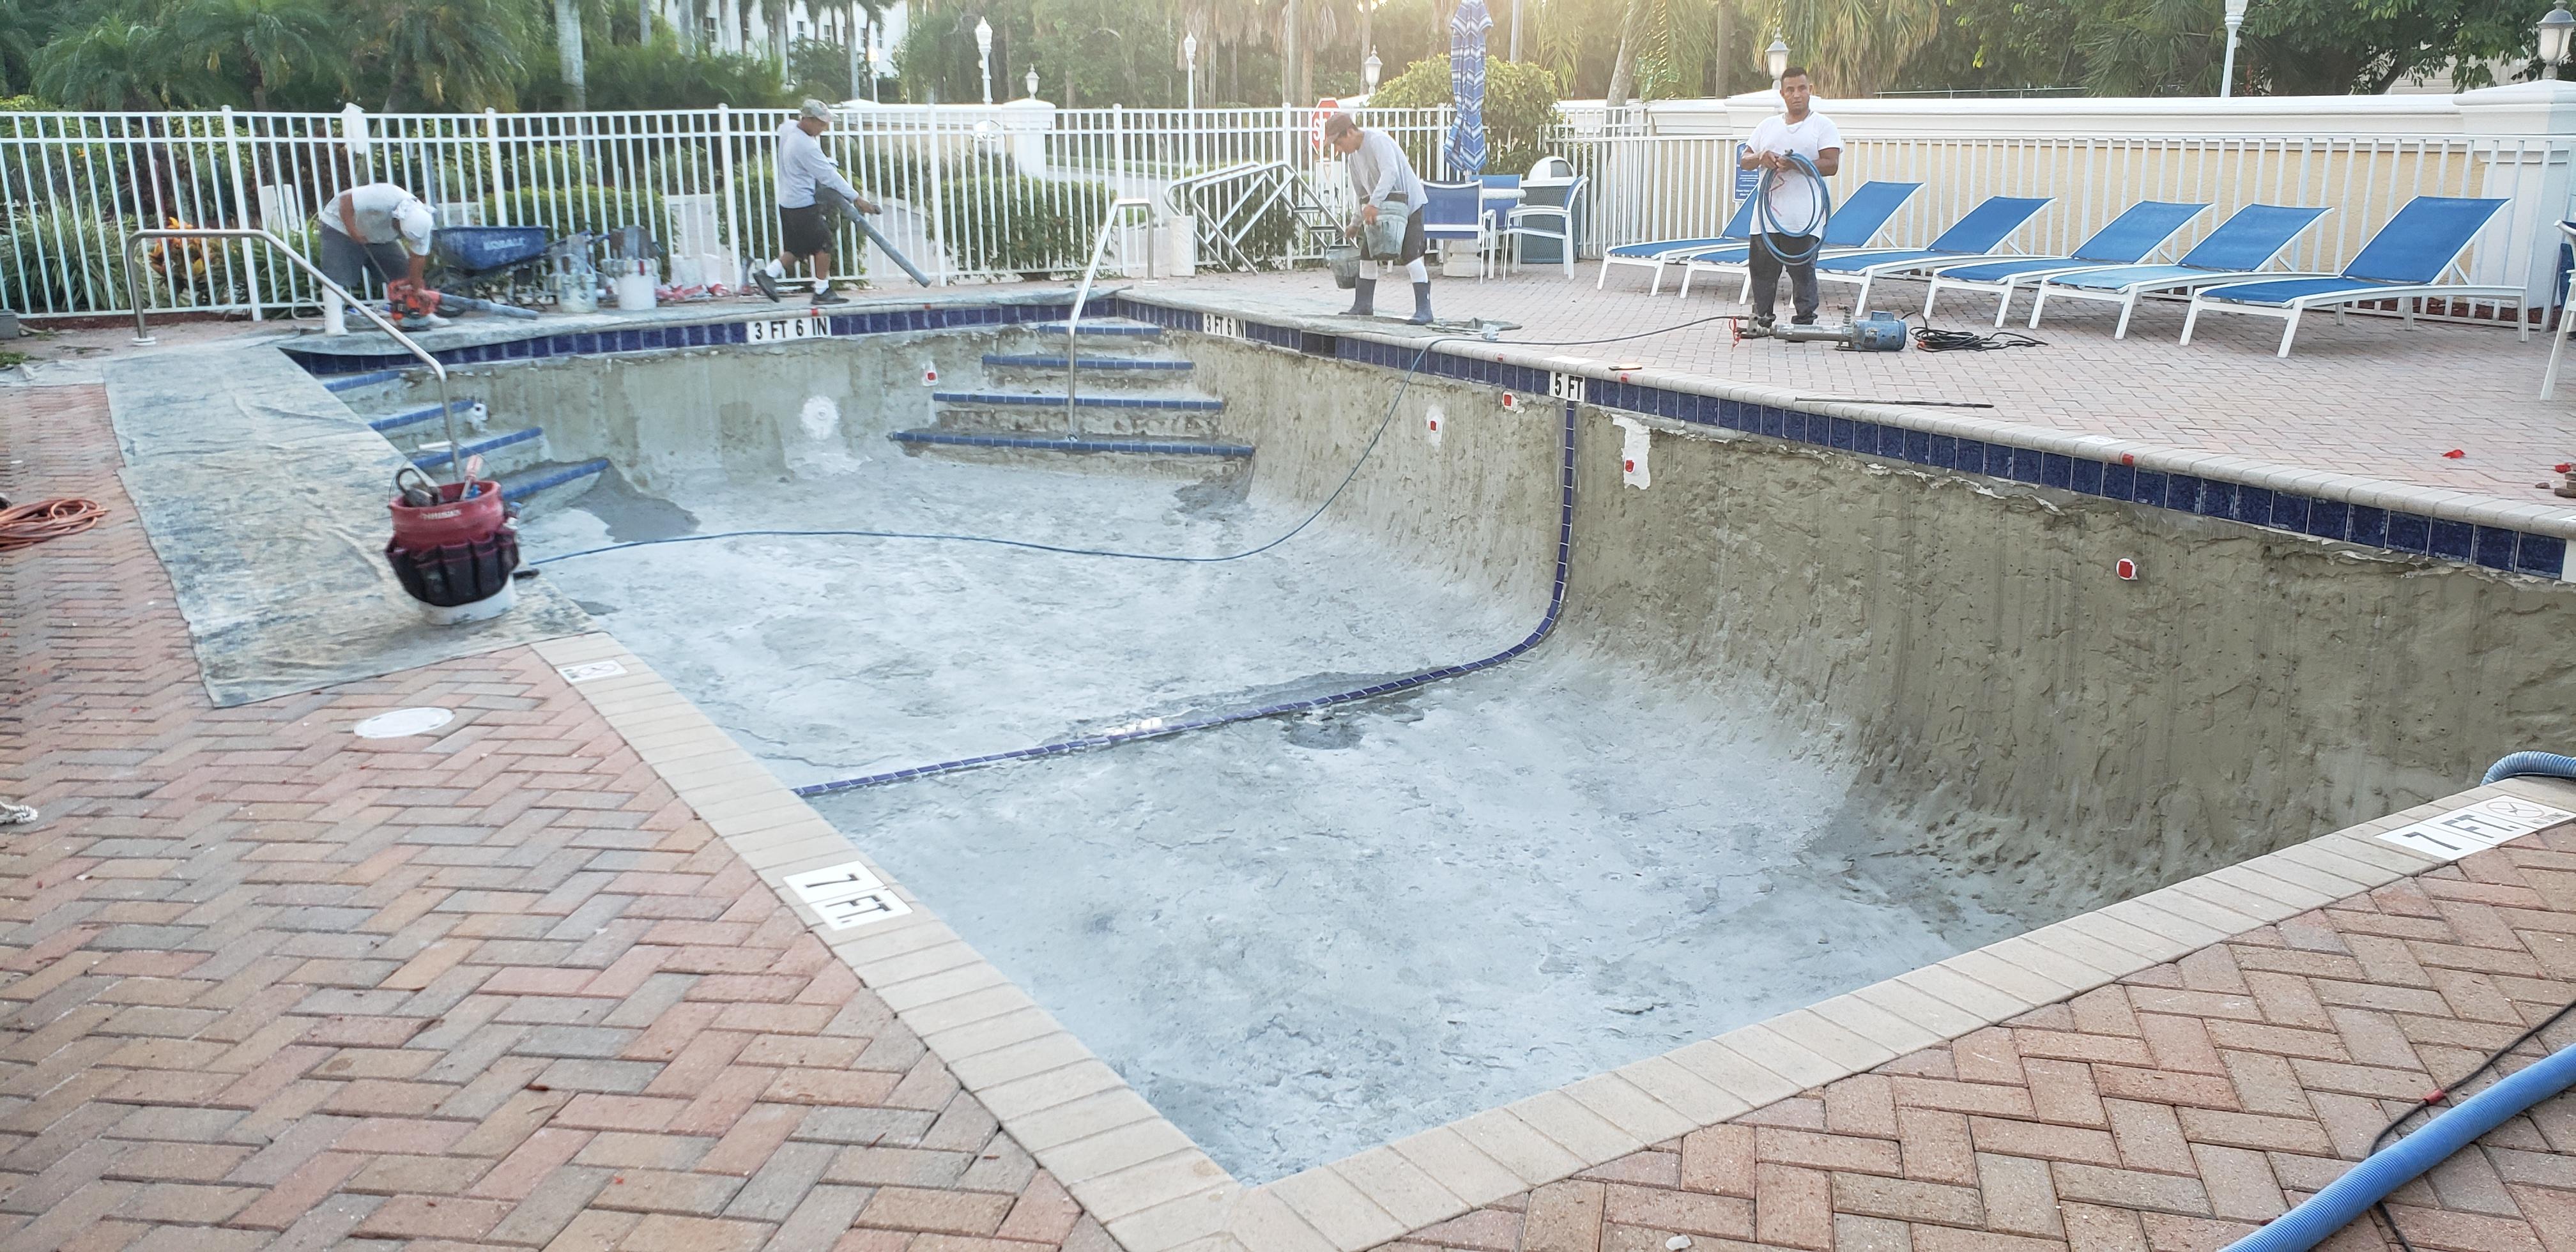 2019-07-24 Pool Resurfacing (3)